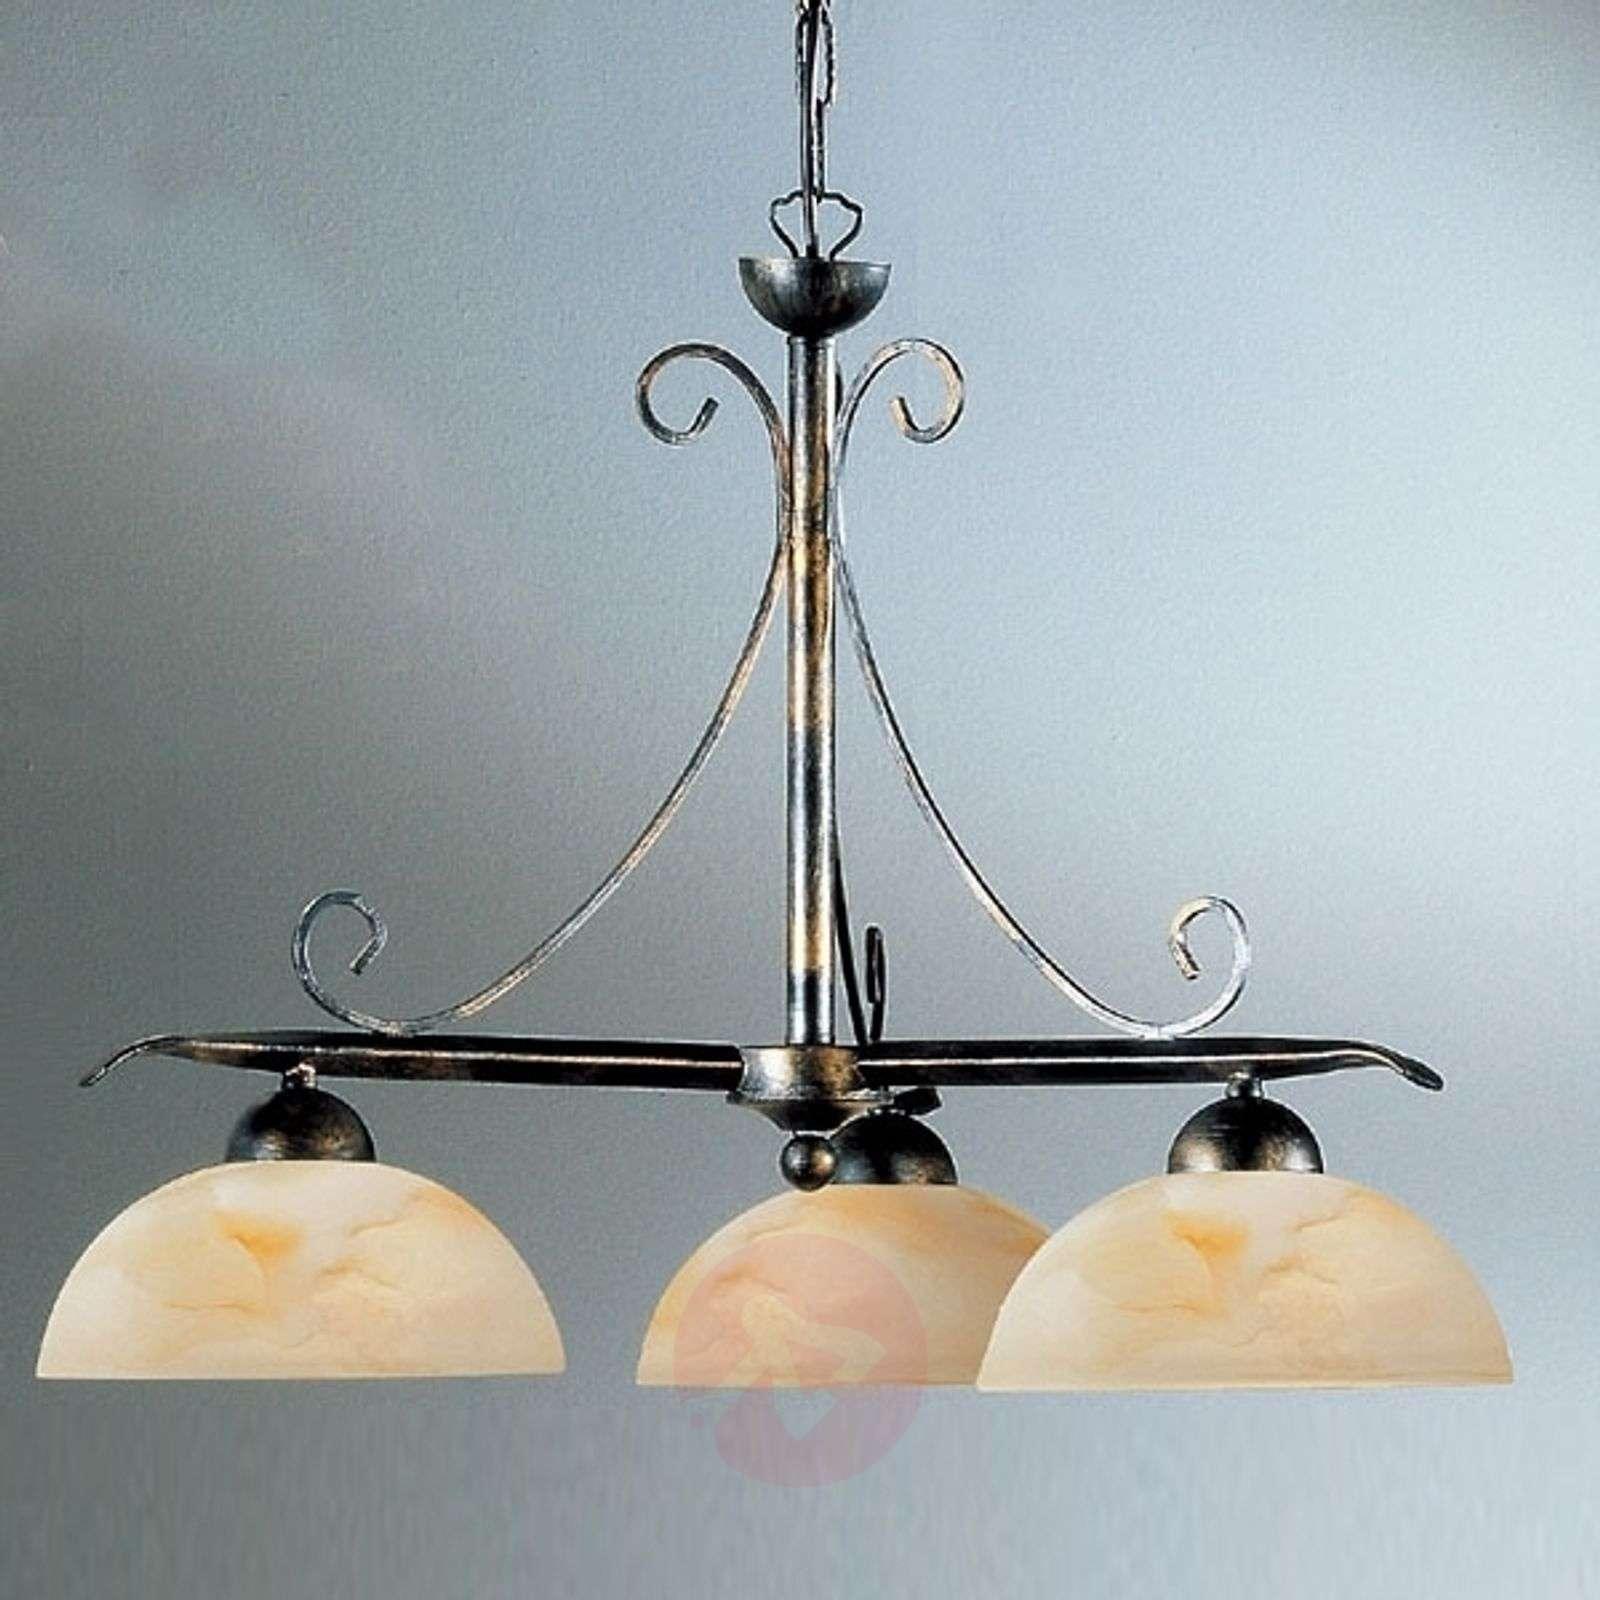 Hanging light DANA, three-bulb-5505180-01